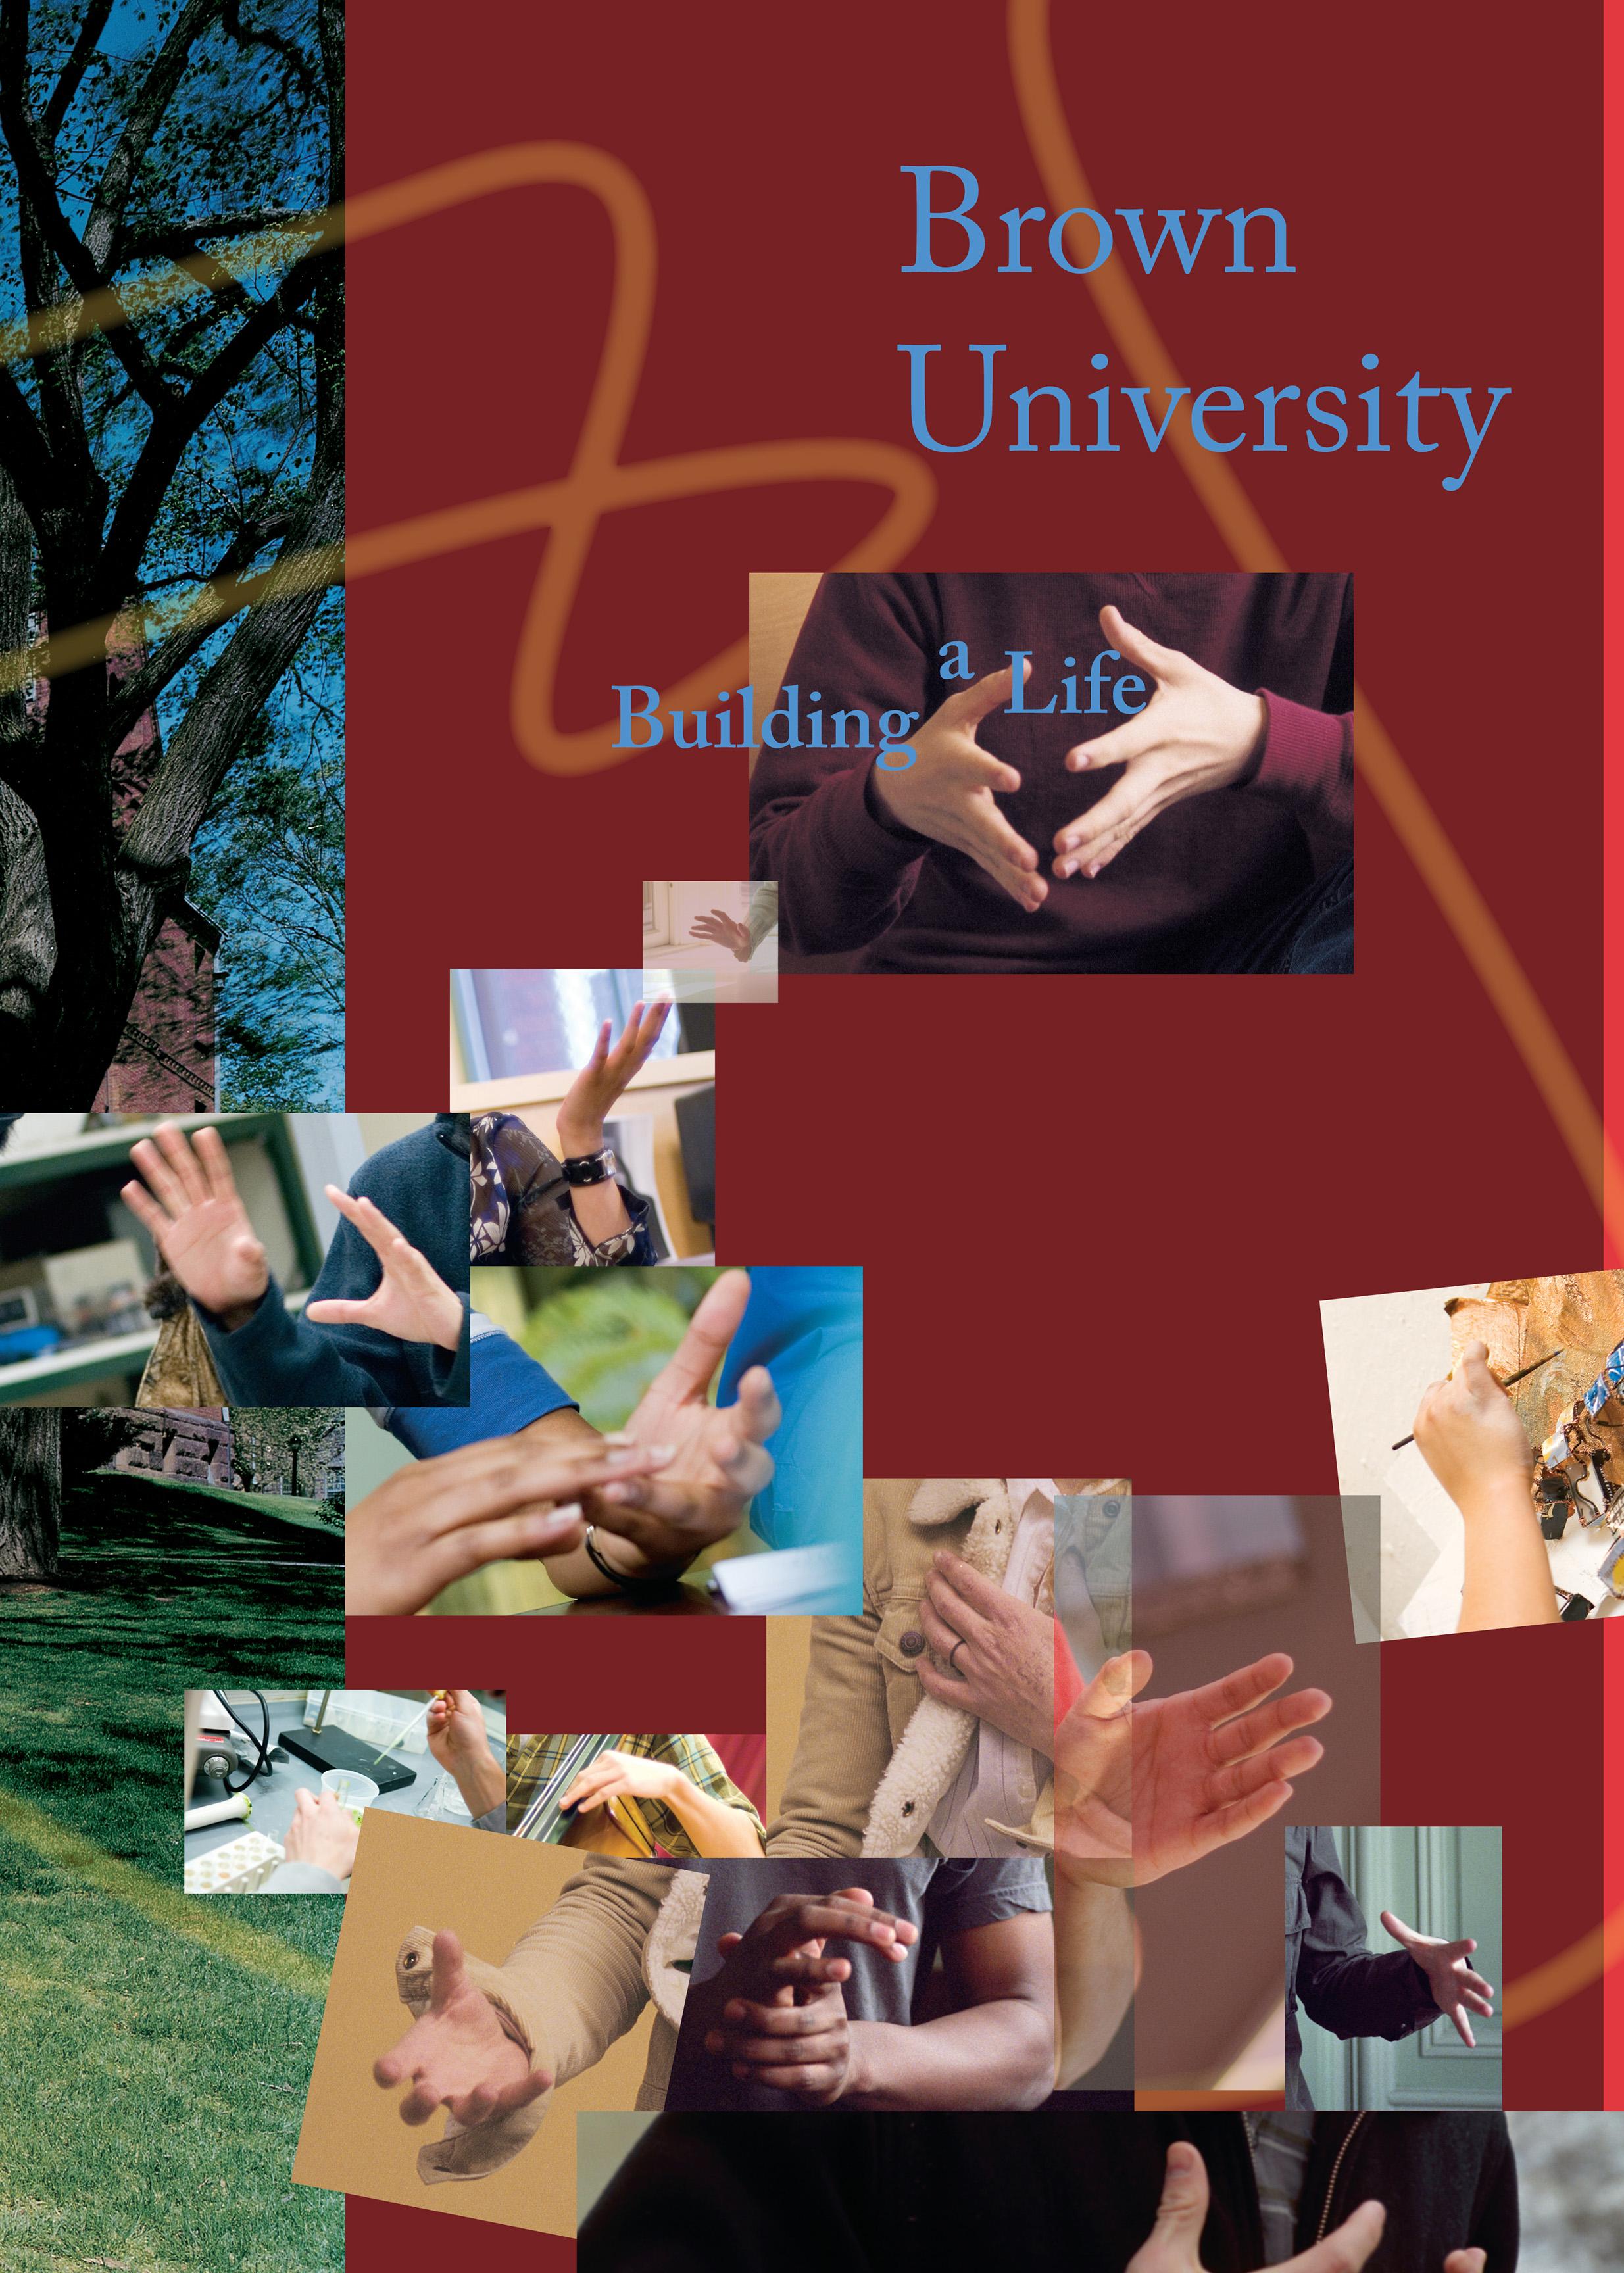 Brown University viewbook cover